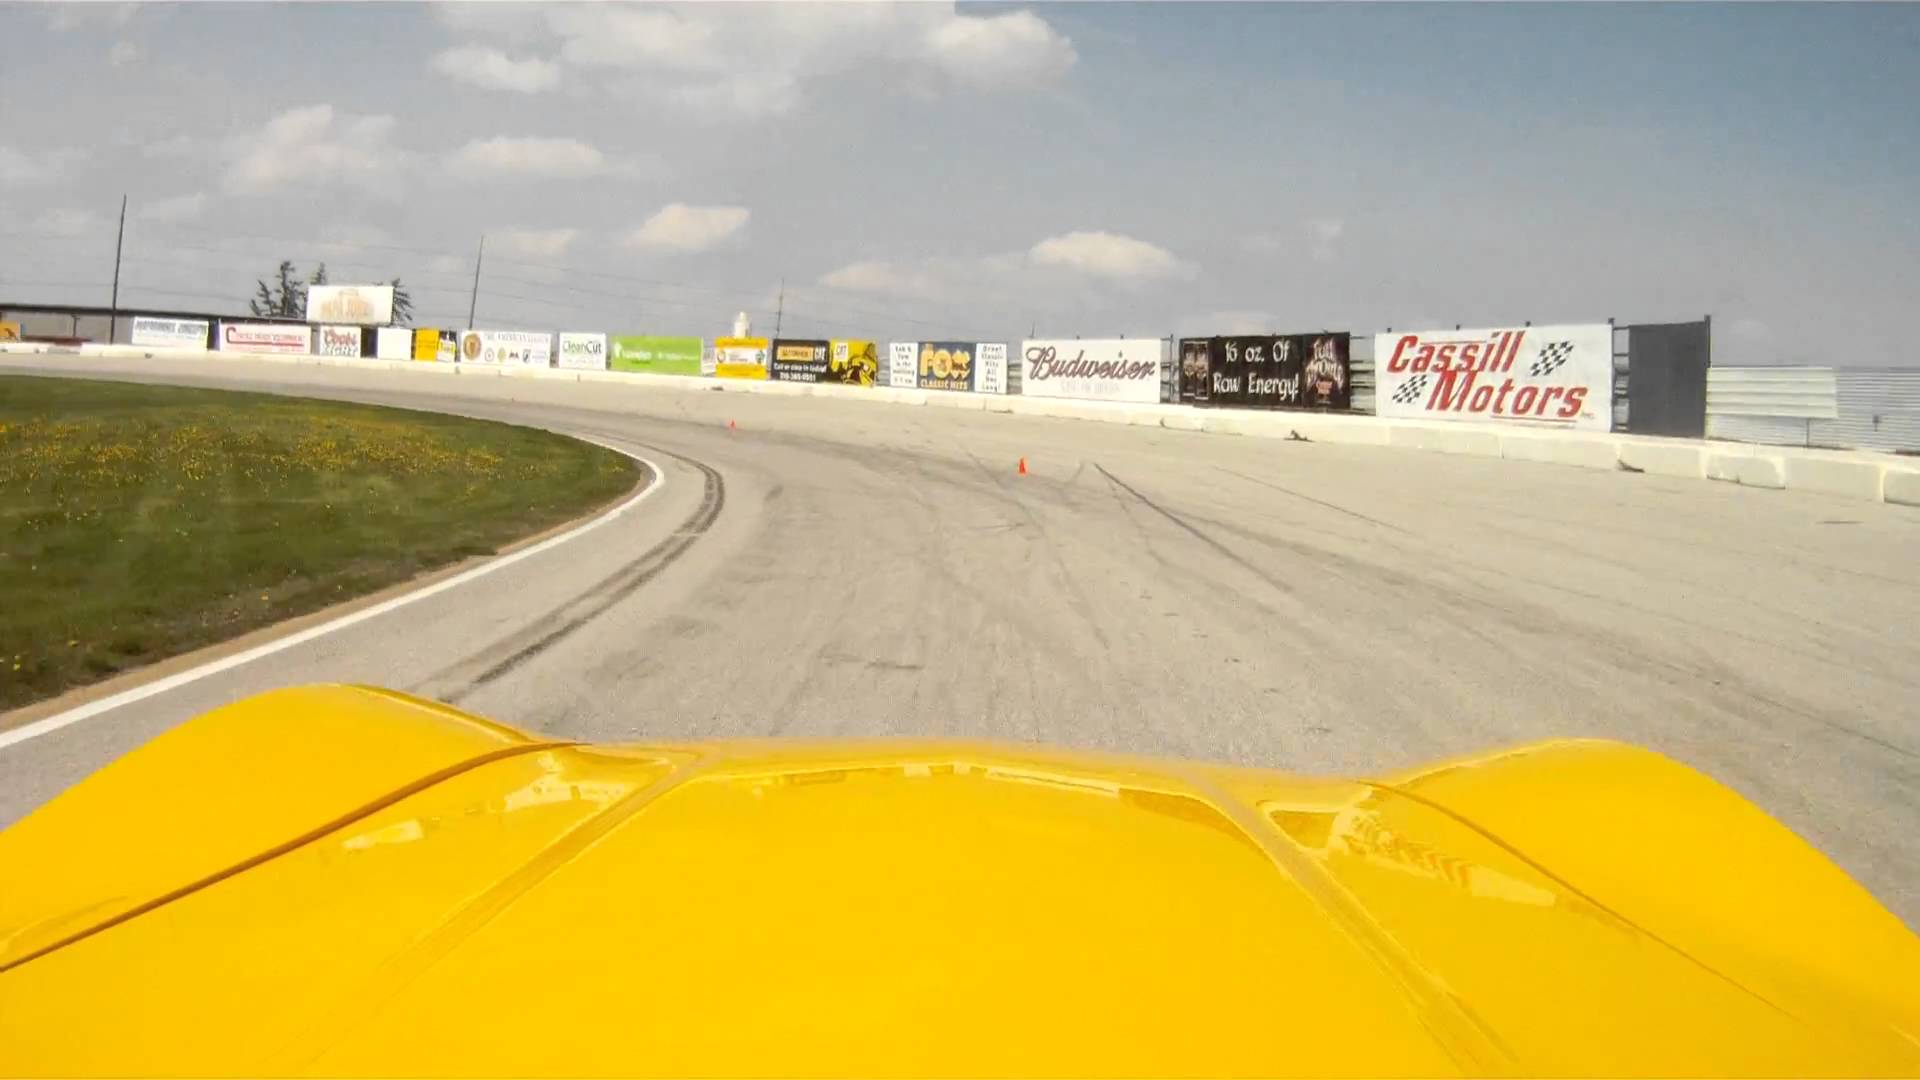 1973 Corvette Autocross racing